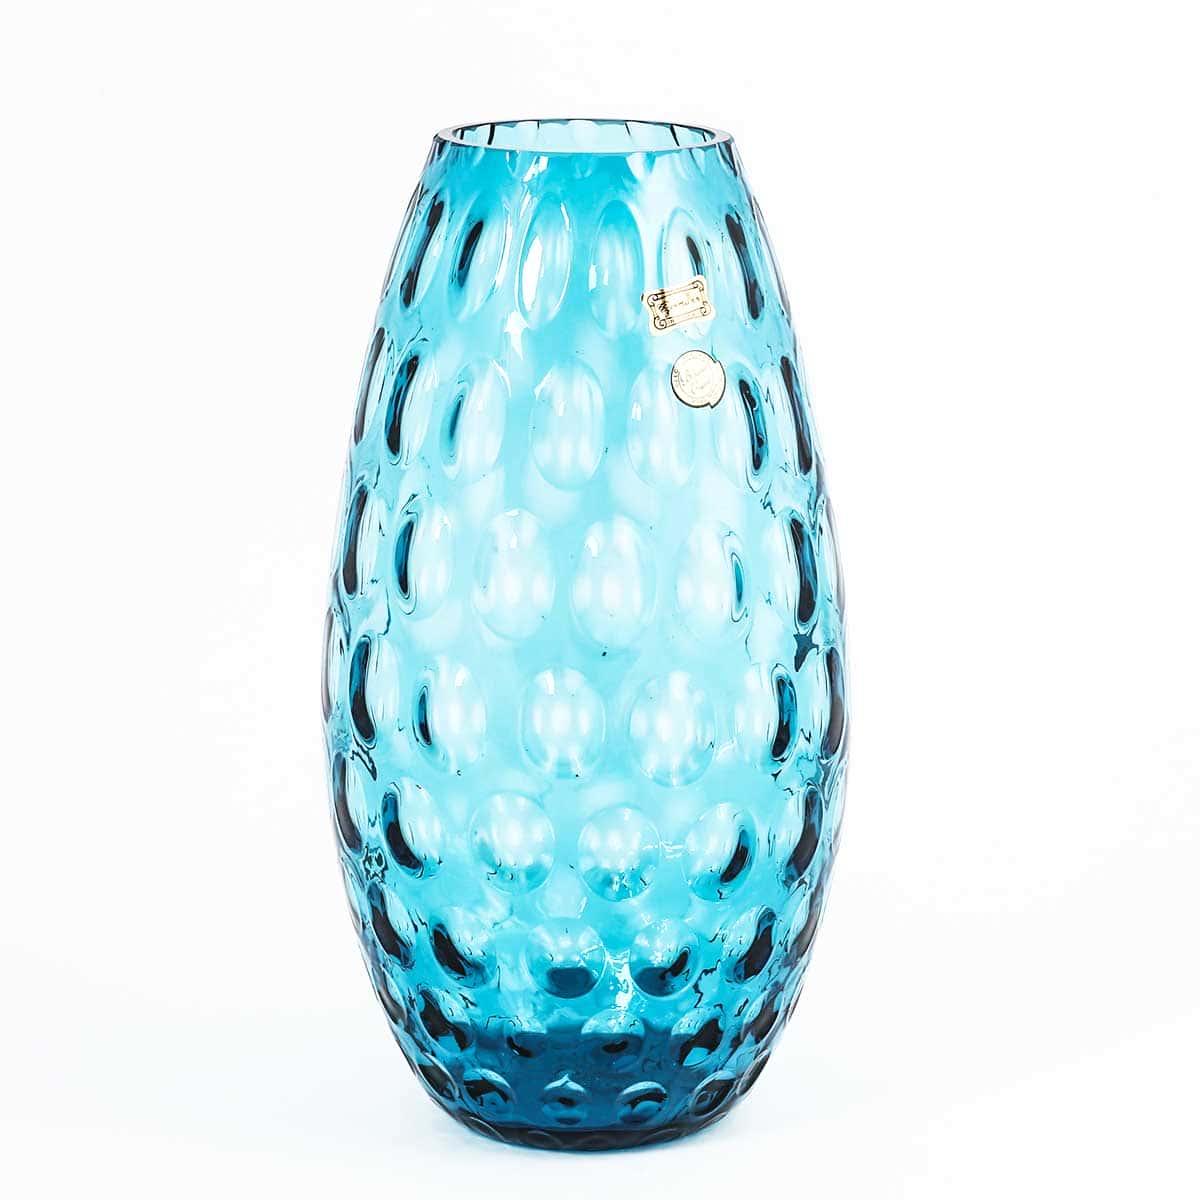 Ваза для цветов 32 см Egermann голубая 36040